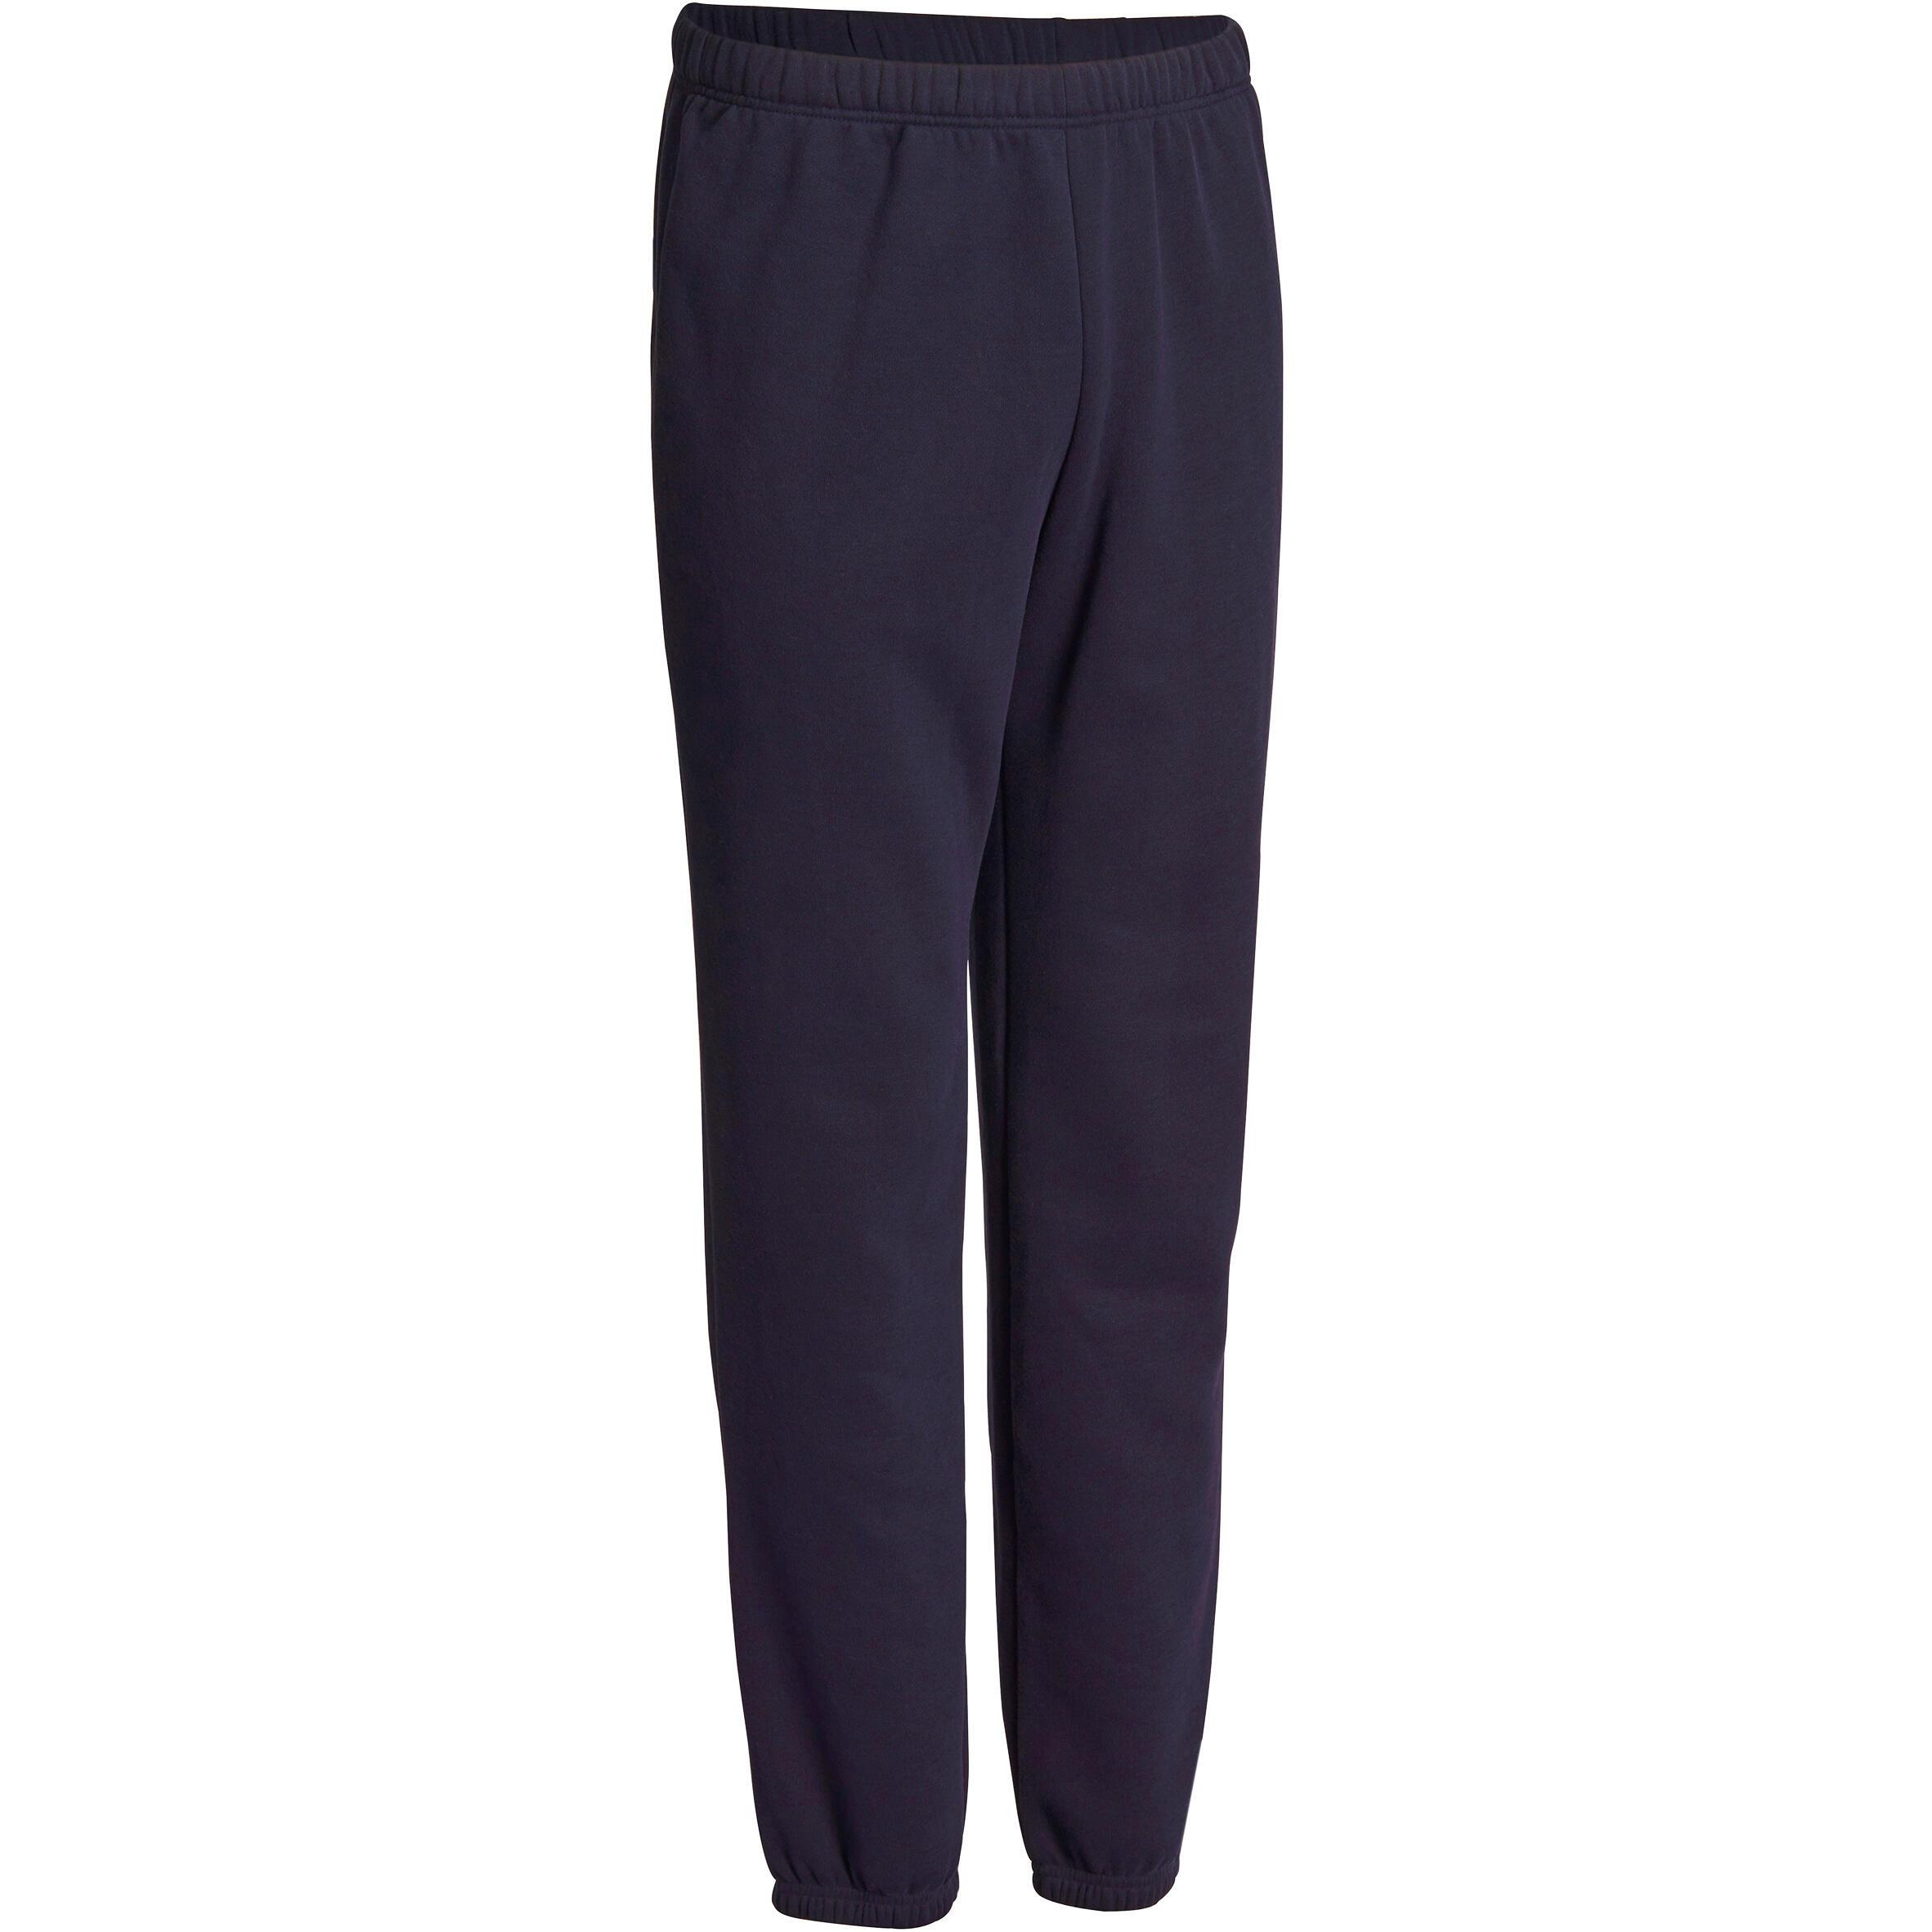 Pantalon 900 régulier gymnastique d'étirement homme bleu marine